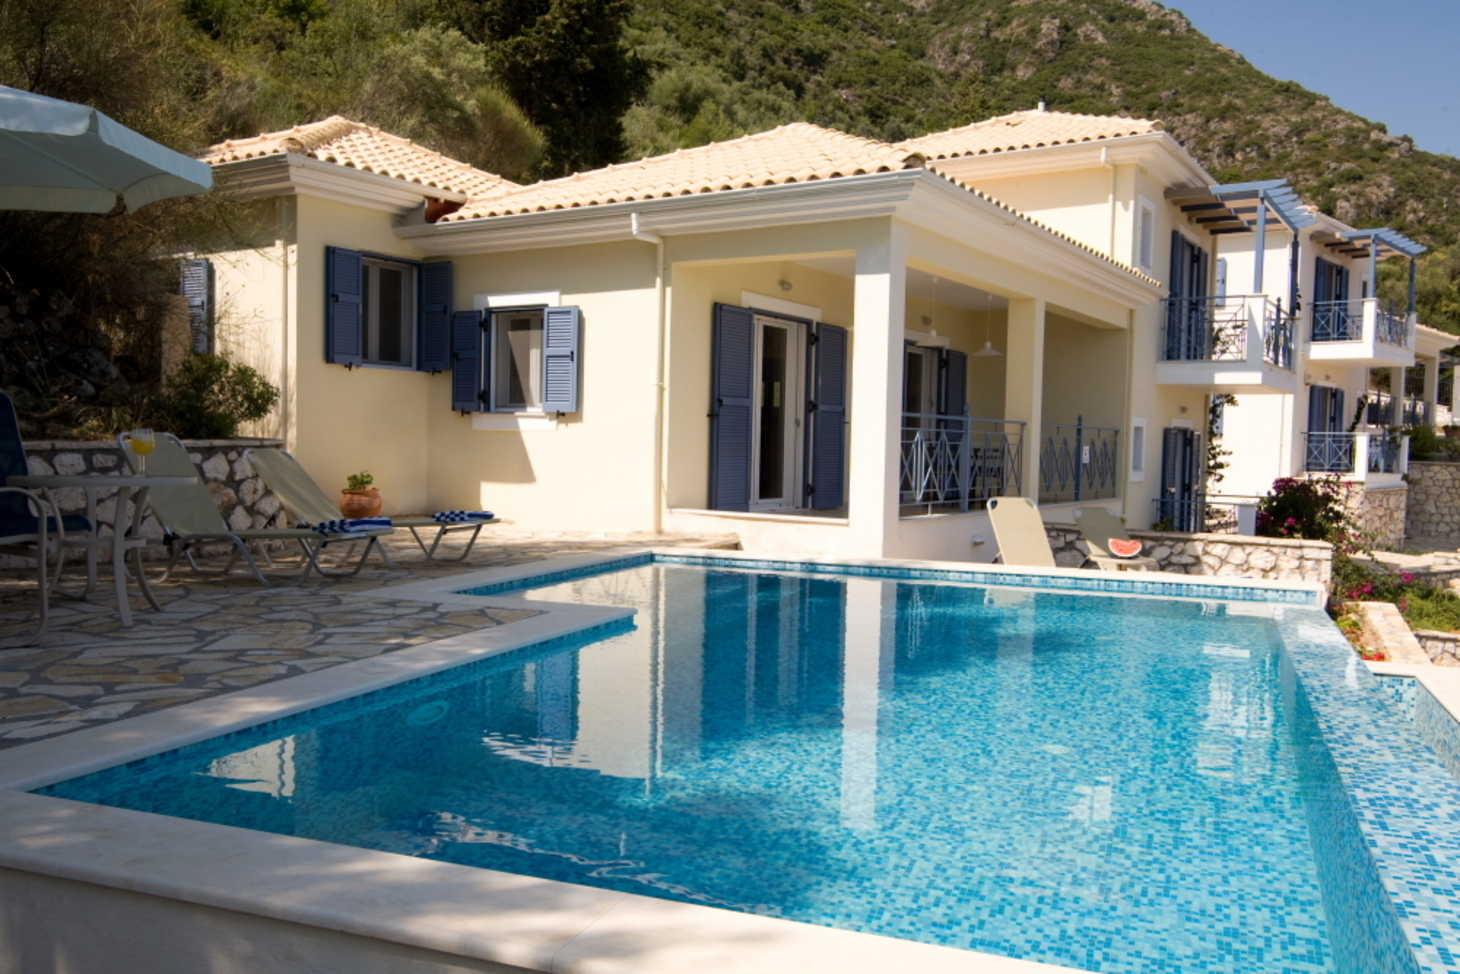 Luxury Villa De La Luna With A Private Infinity Pool And